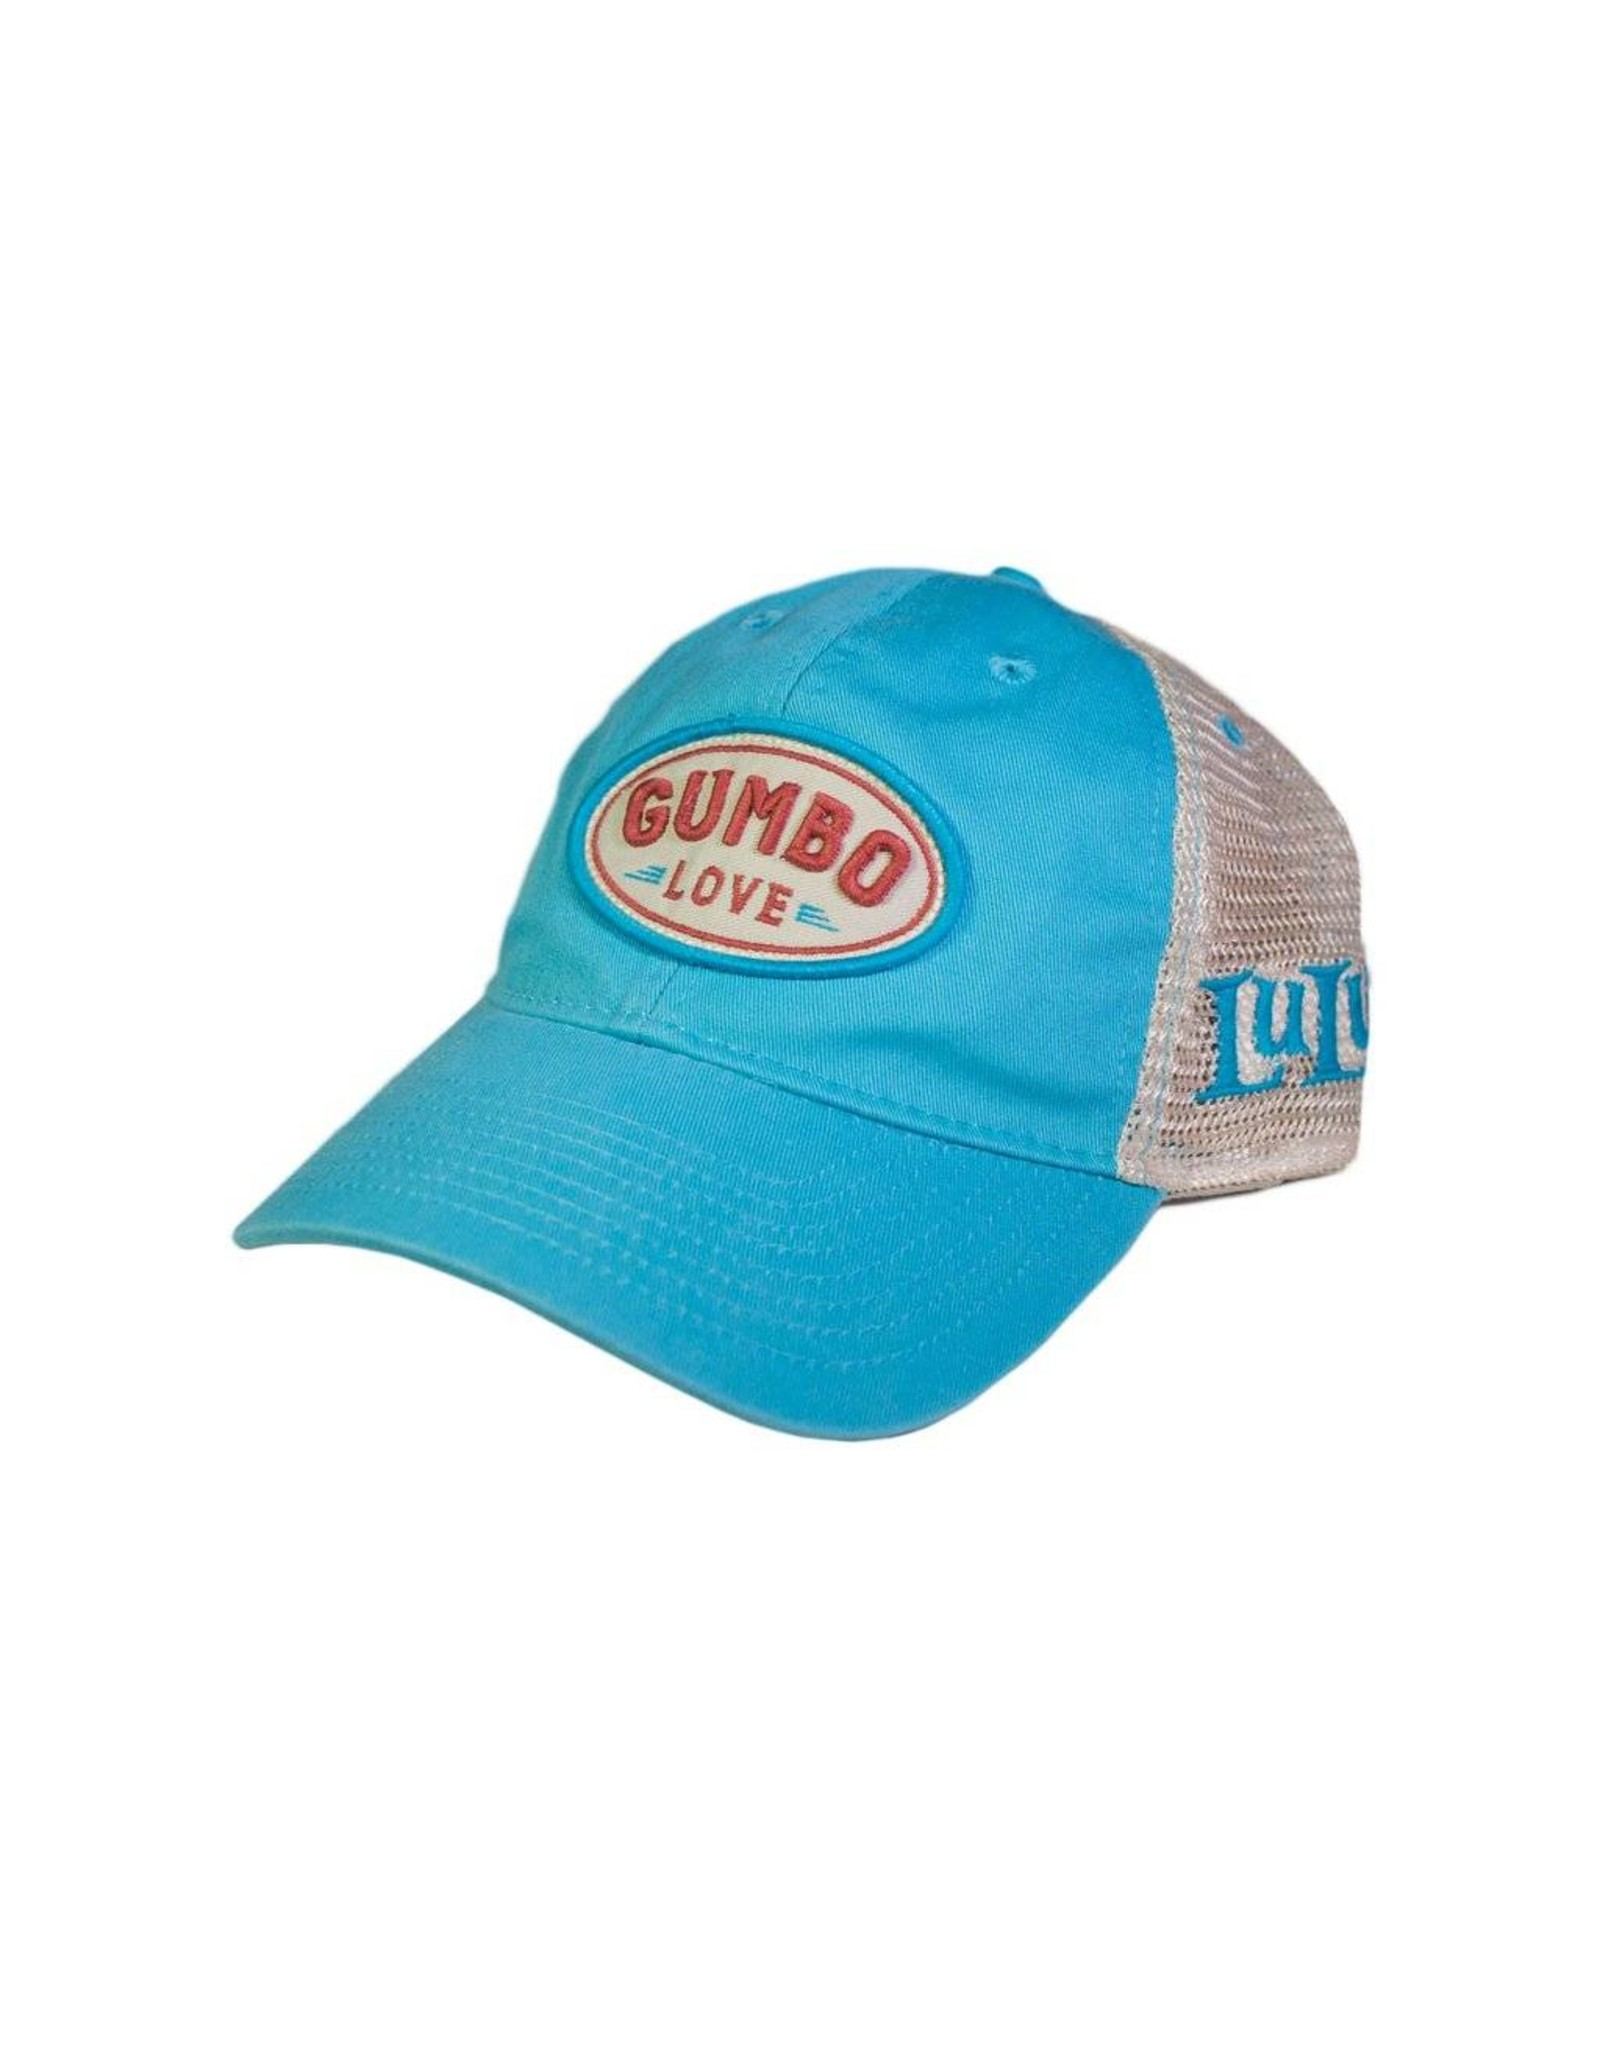 Gumbo Love Patch Trucker Hat